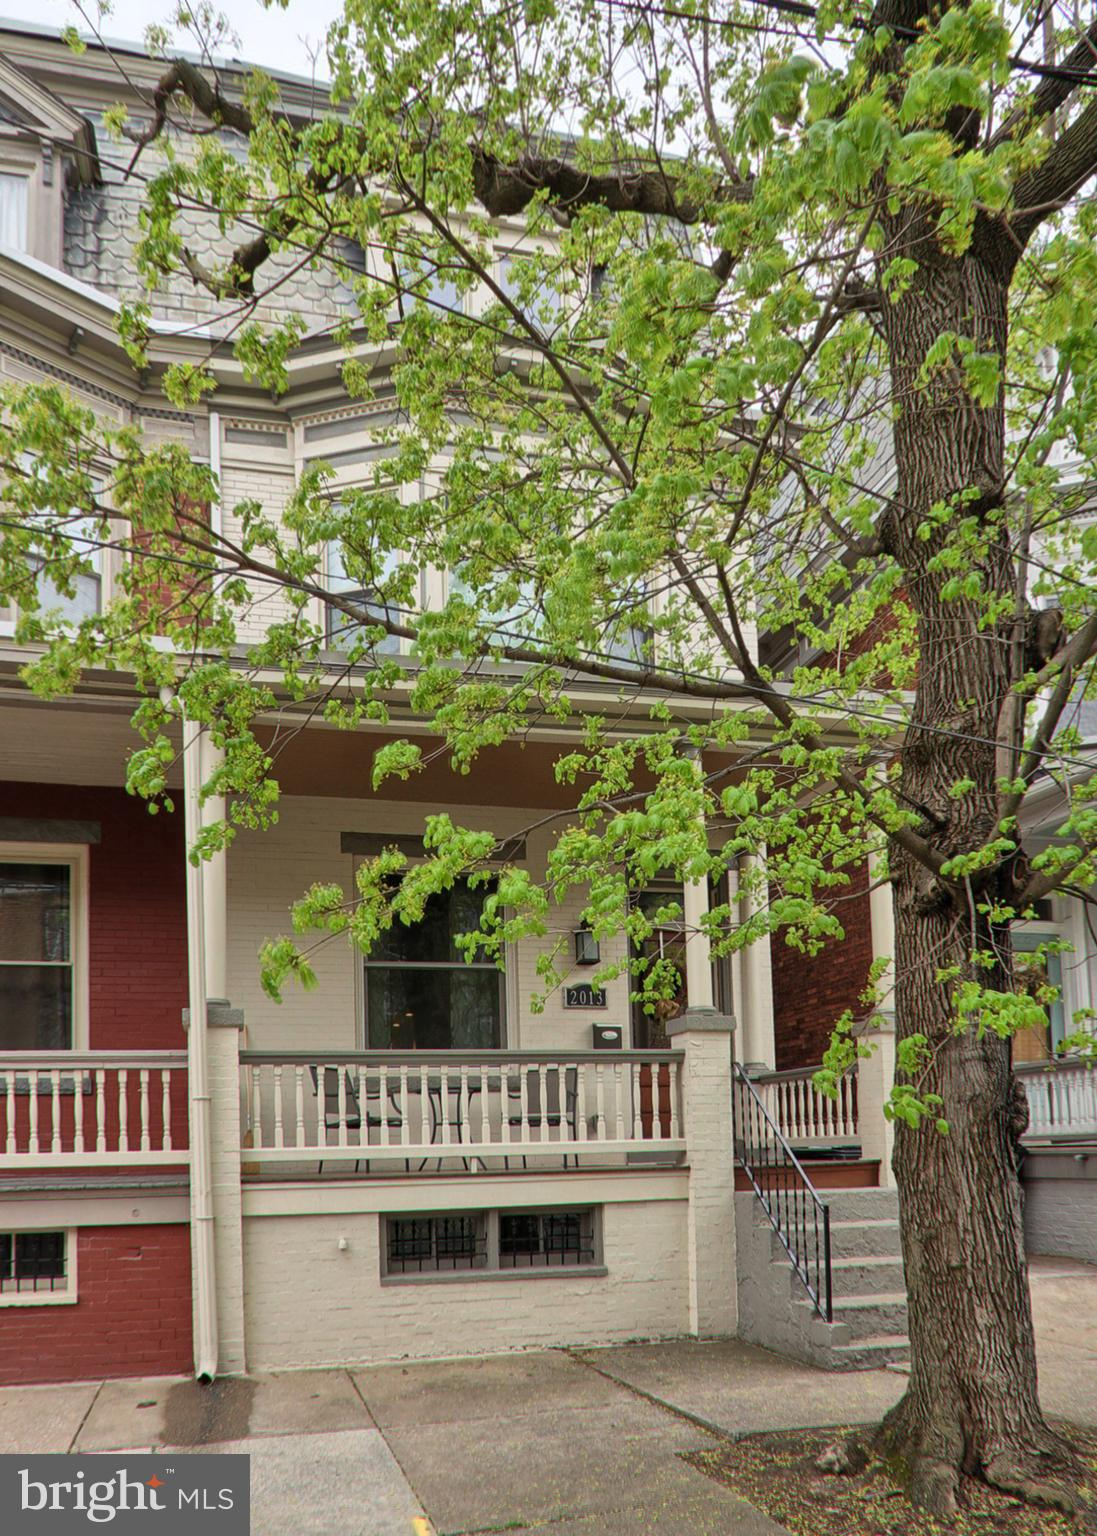 2013 GREEN STREET, HARRISBURG, PA 17102